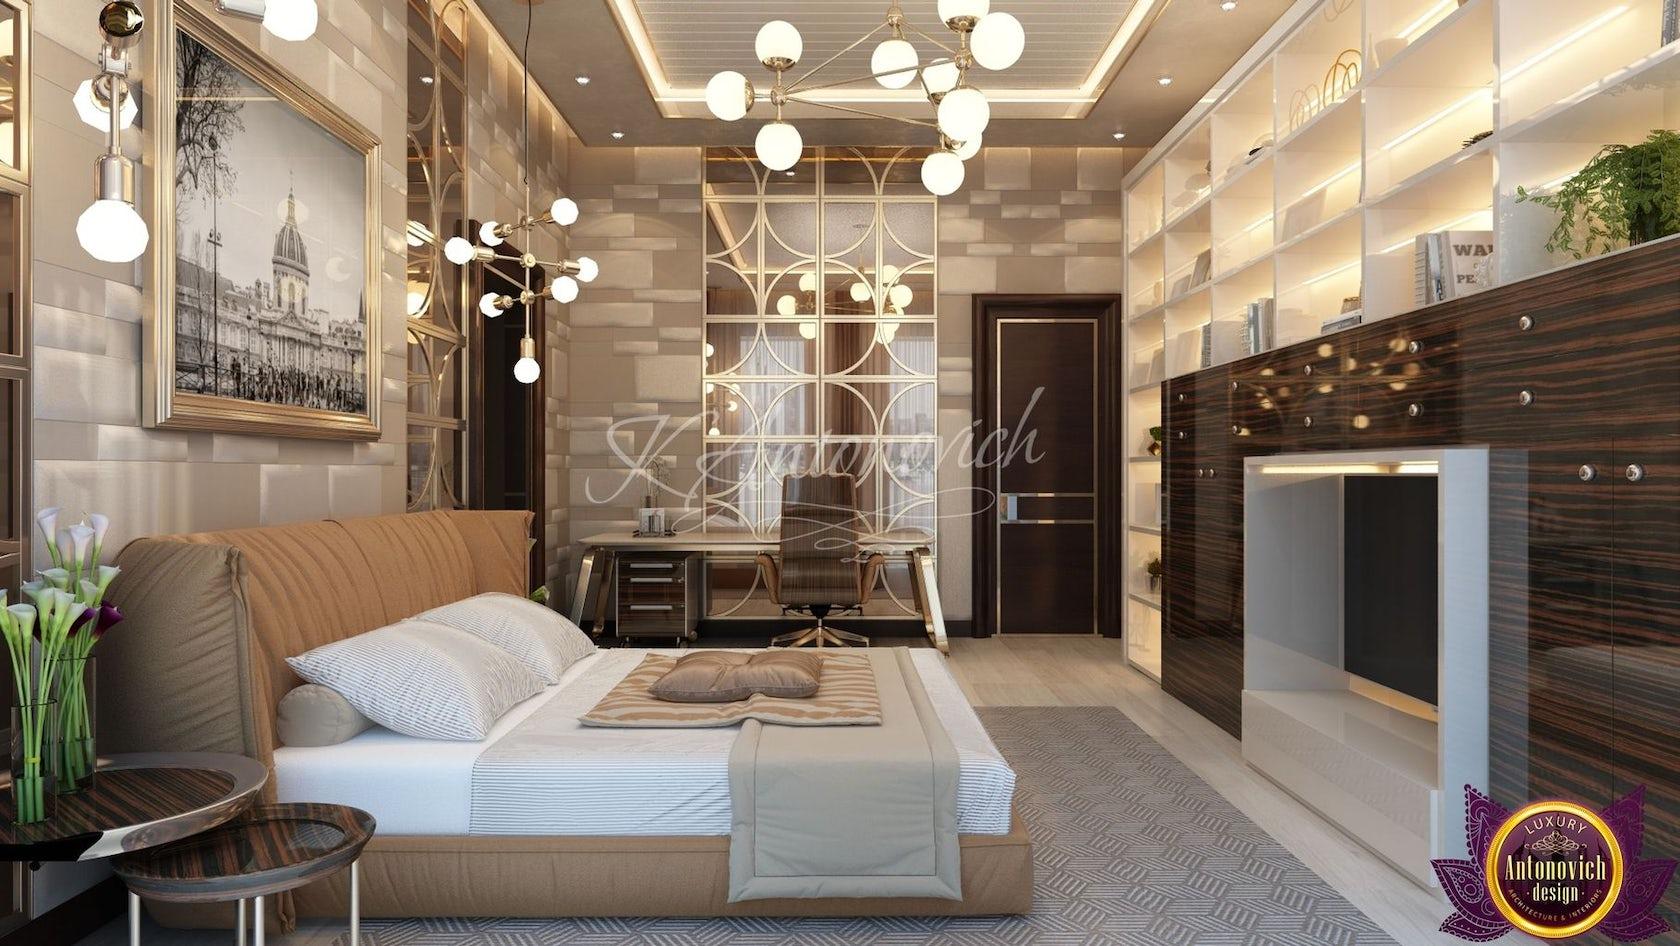 Bedroom interior in the Modern style of Katrina Antonovich on Architizer